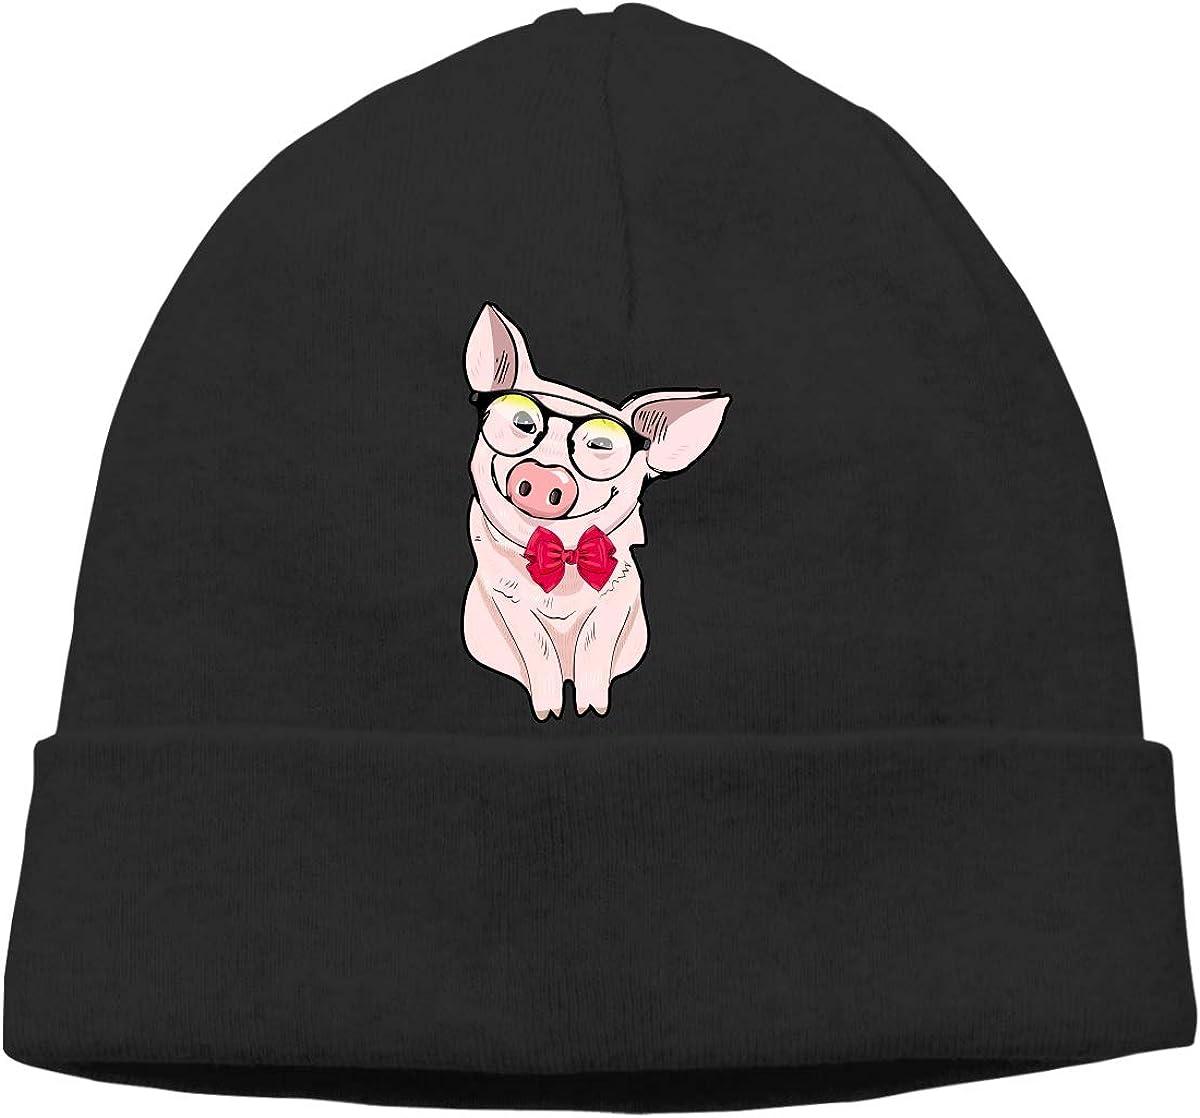 Thick Woolen Cap for Unisex Pig Dabbing Skull Cap